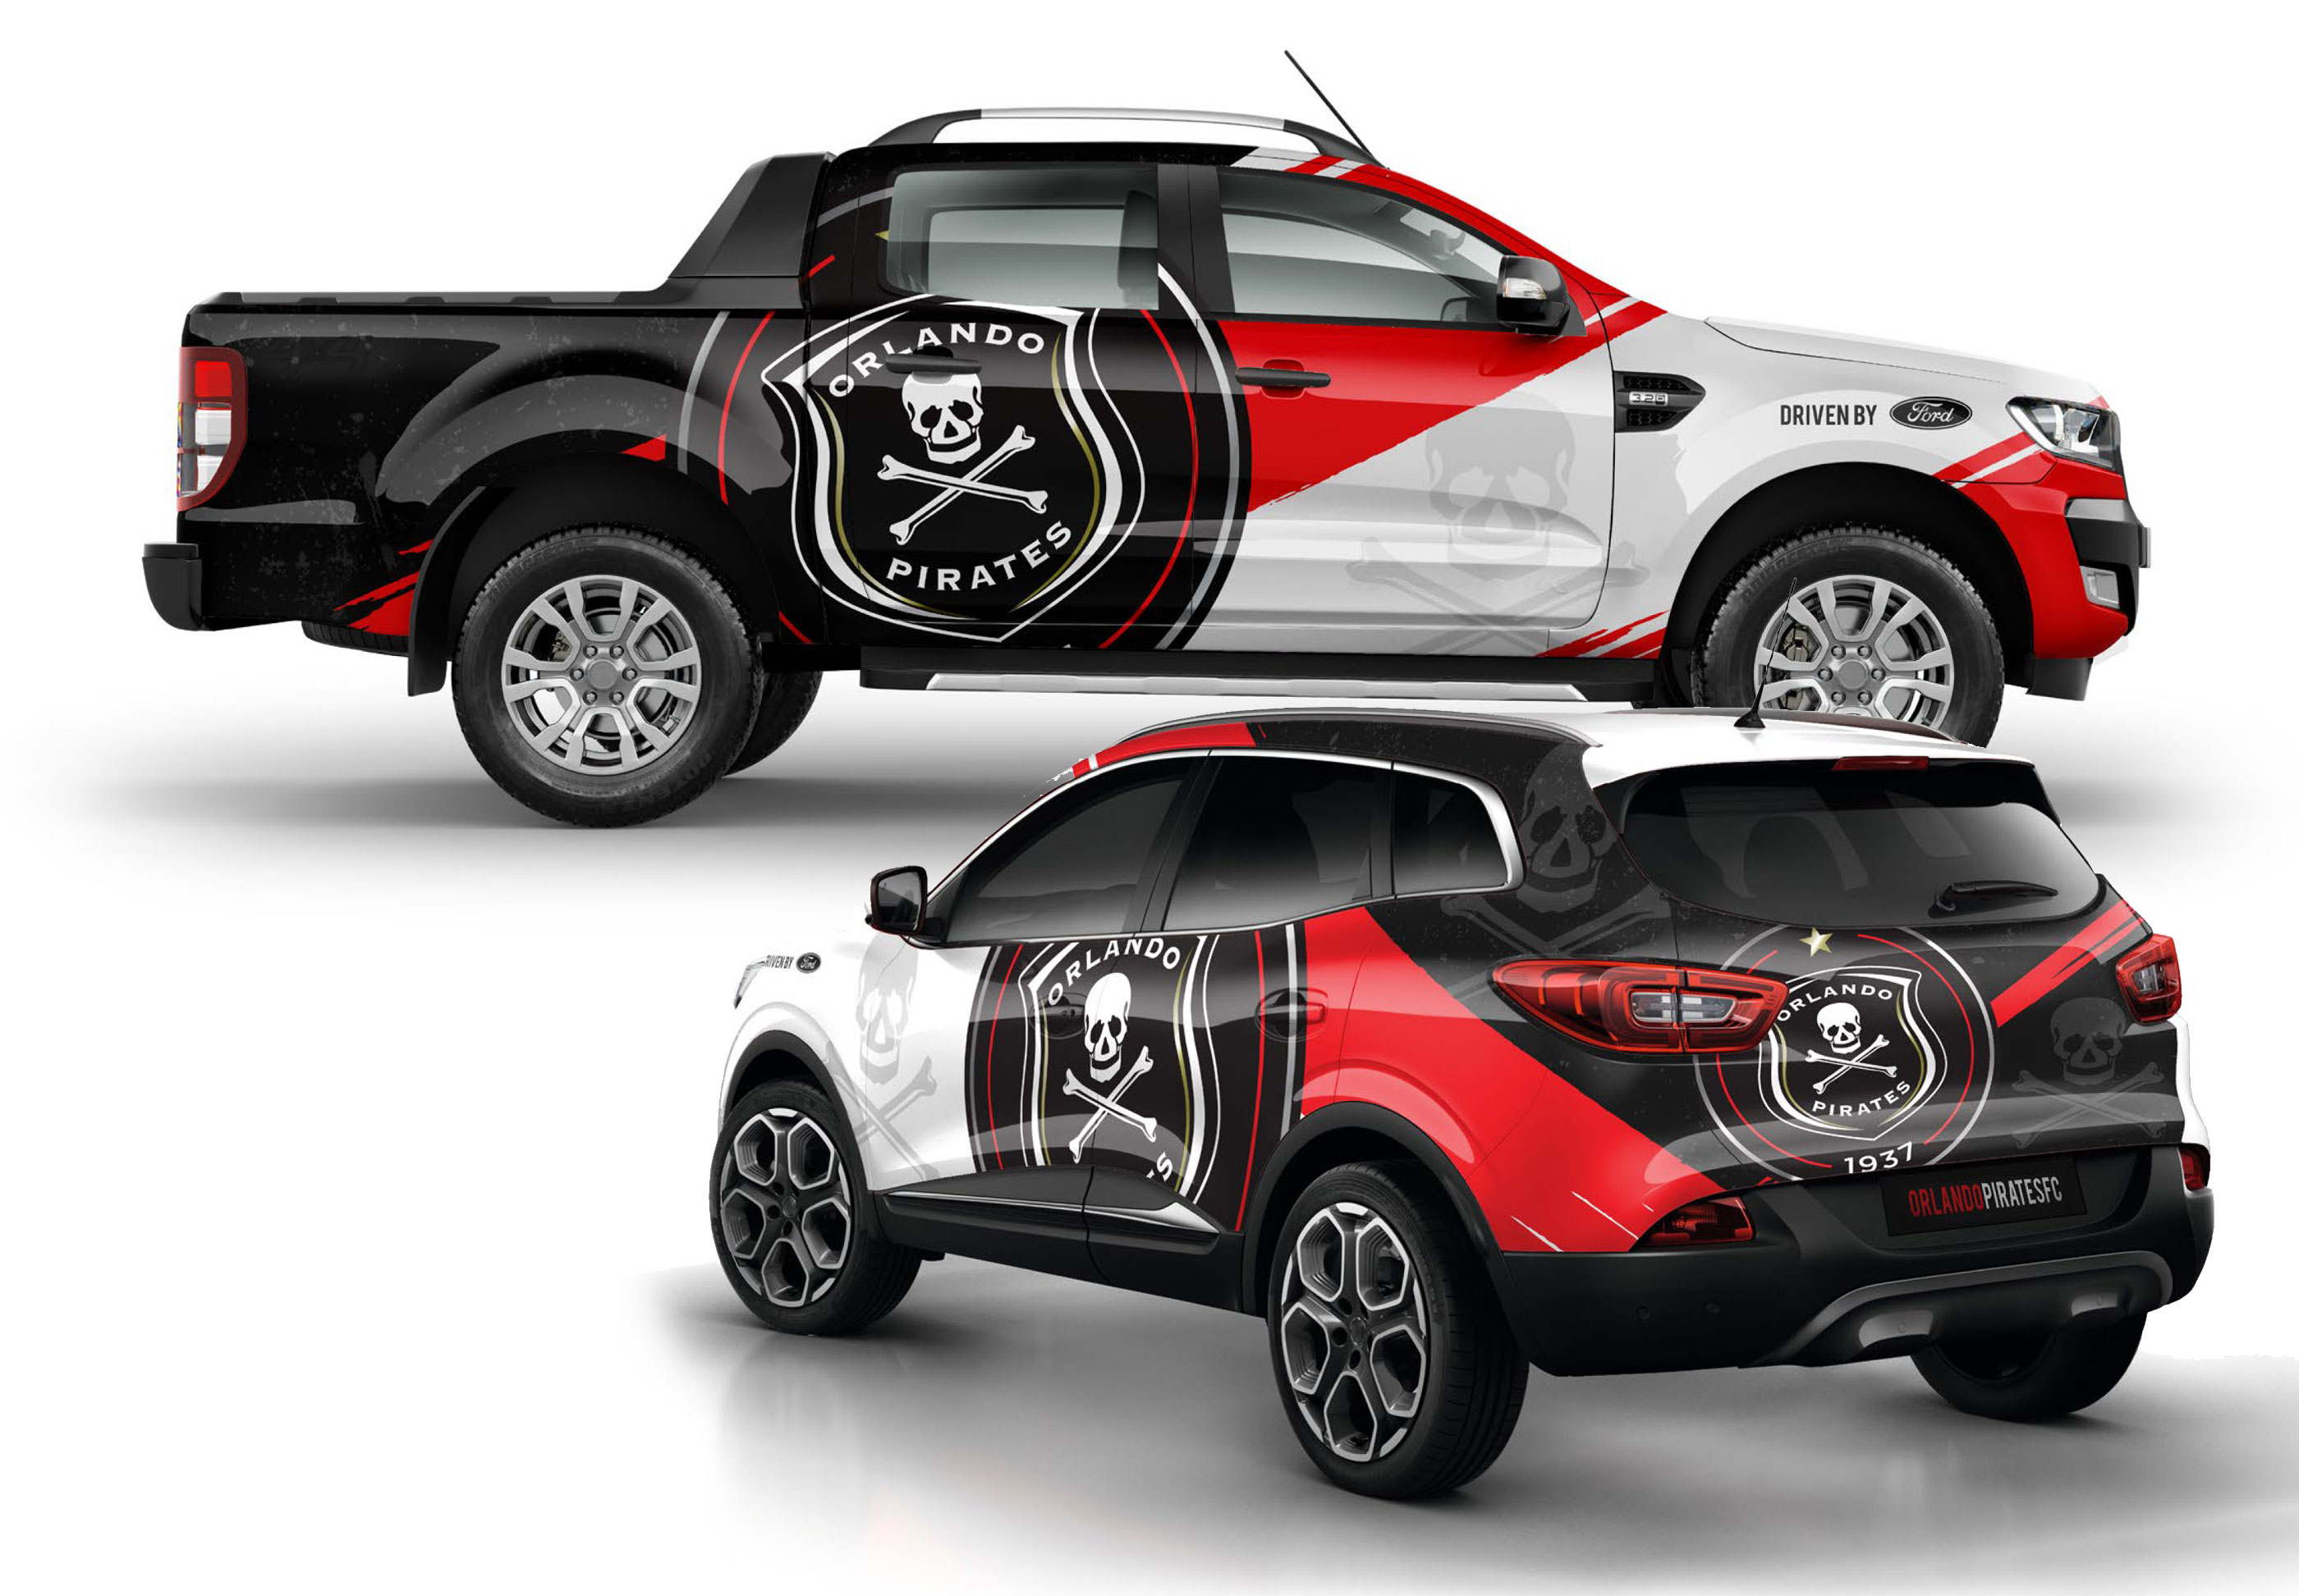 graphic-design-orlando-pirates-fc-vehicle-branding-design-by-agent-orange-design.jpg